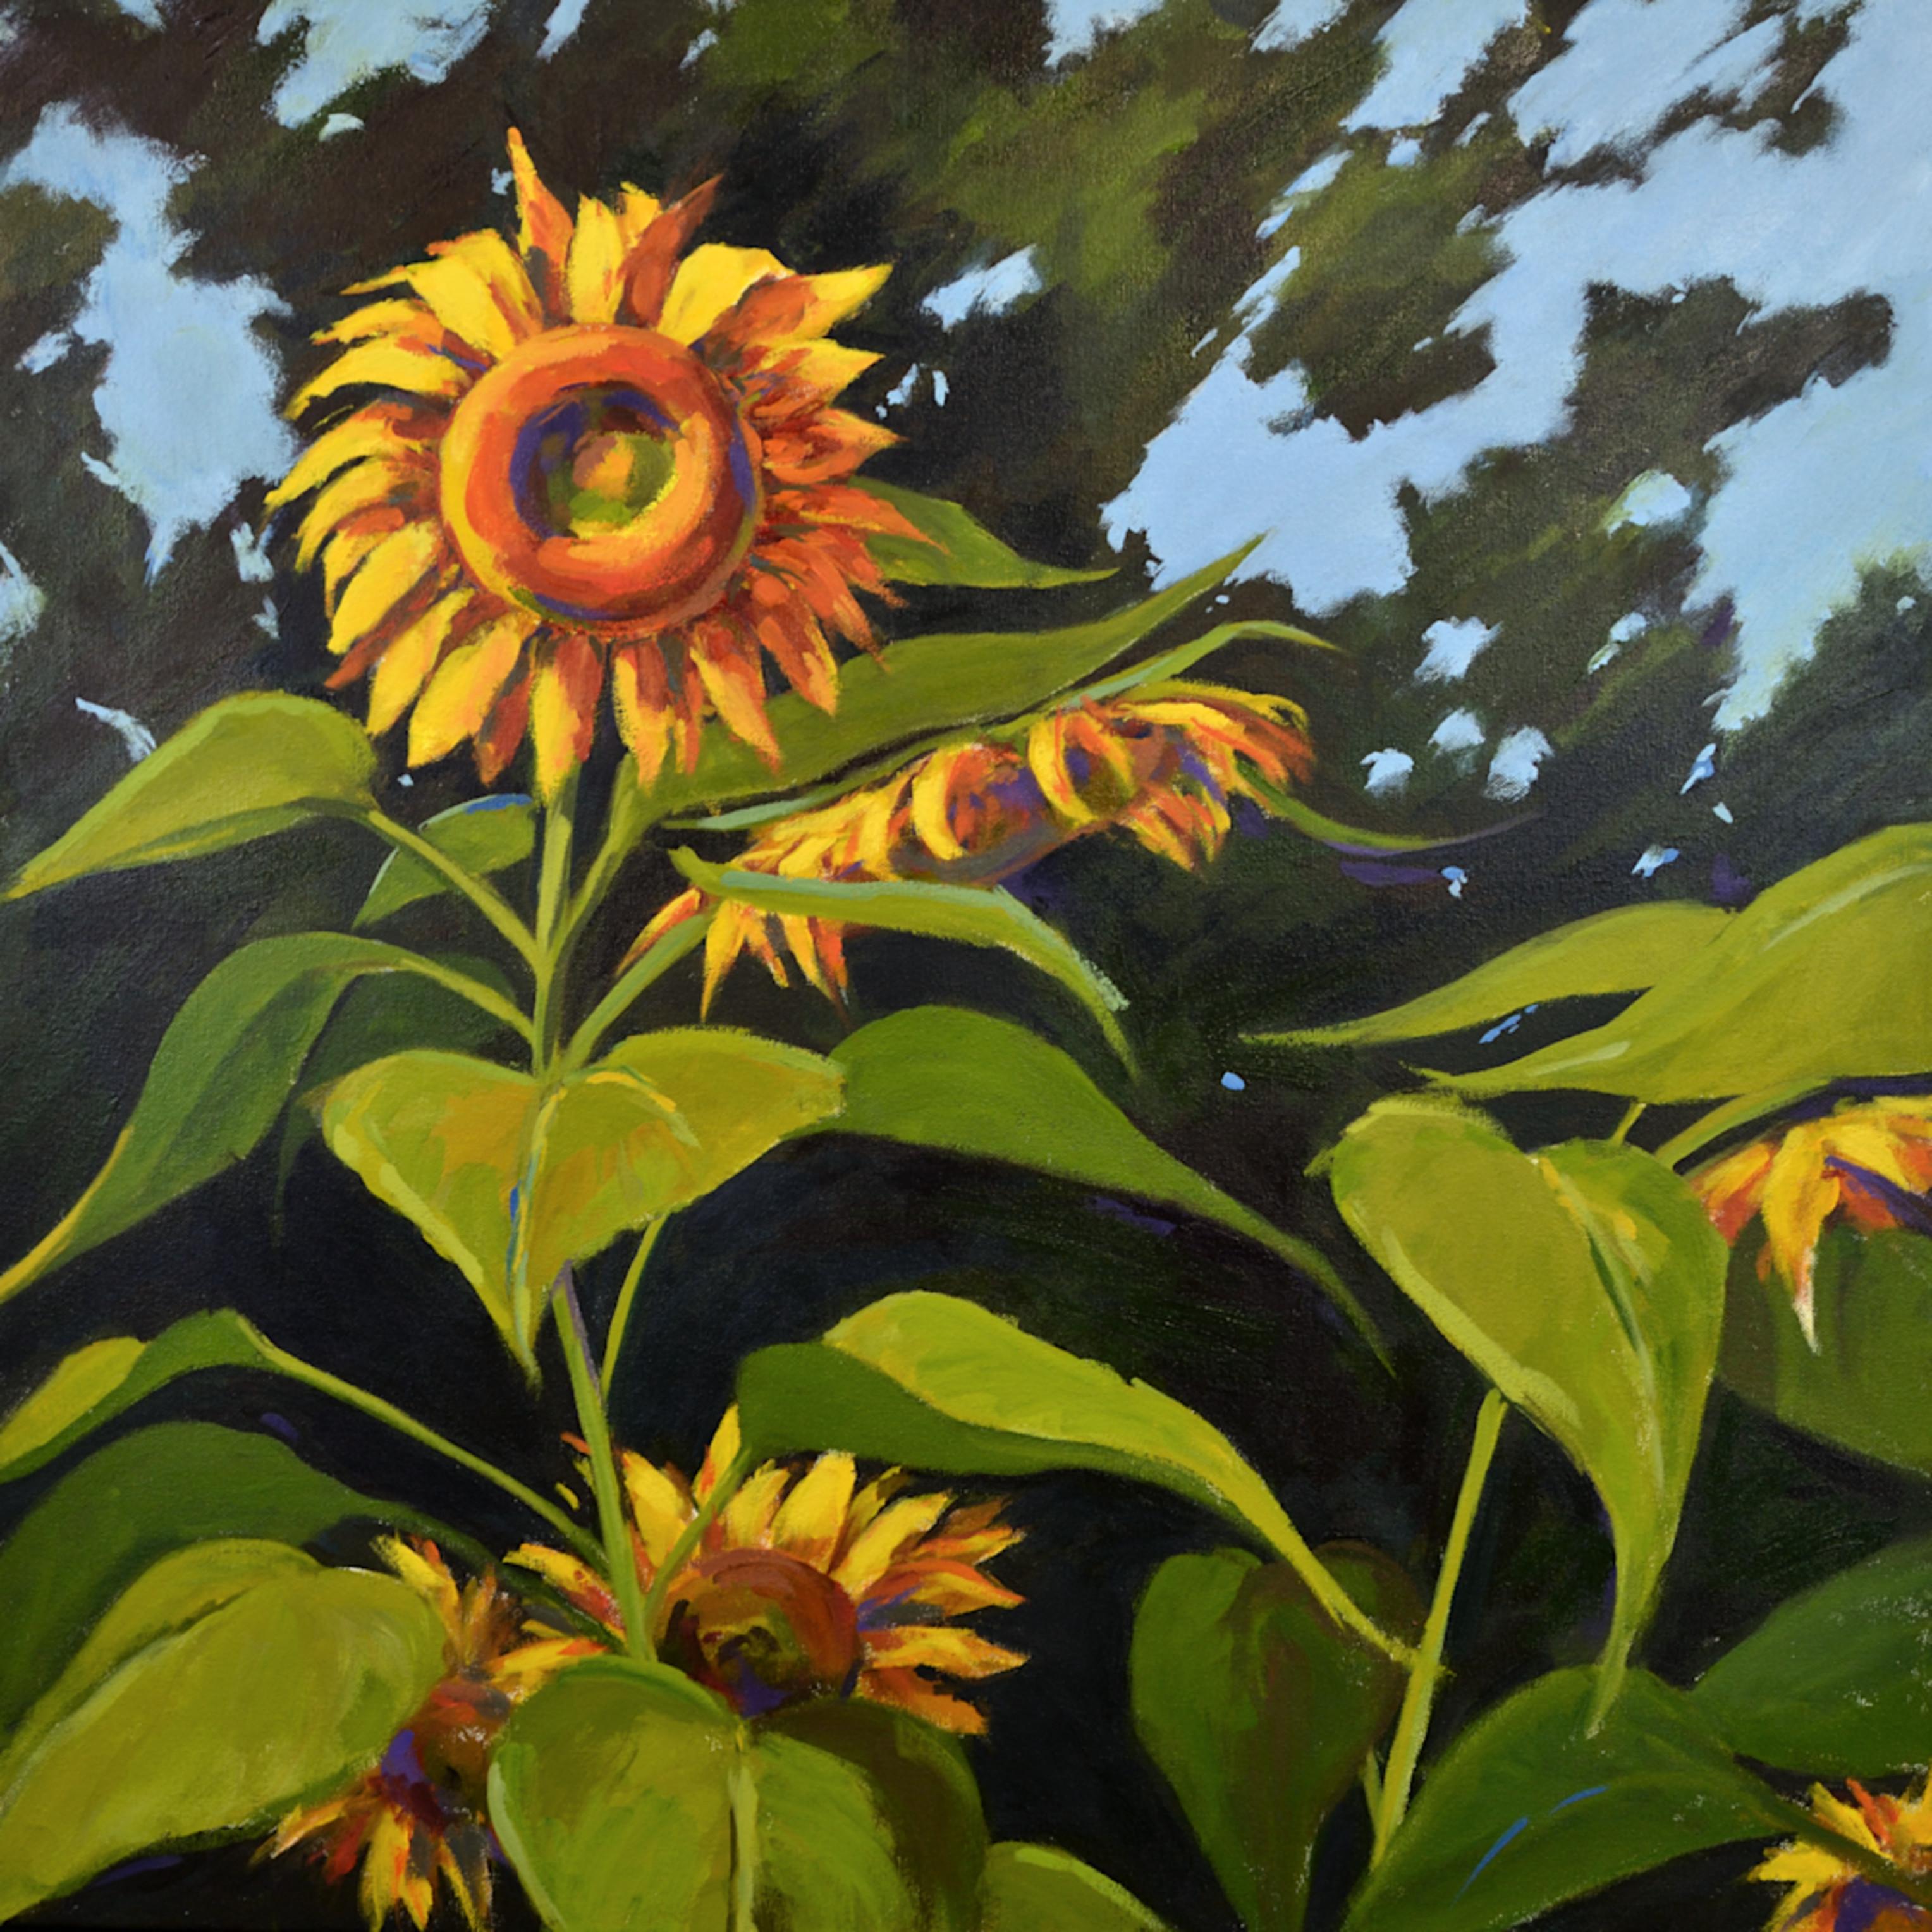 Hallgren largesunflowers 30x30 owgd4i